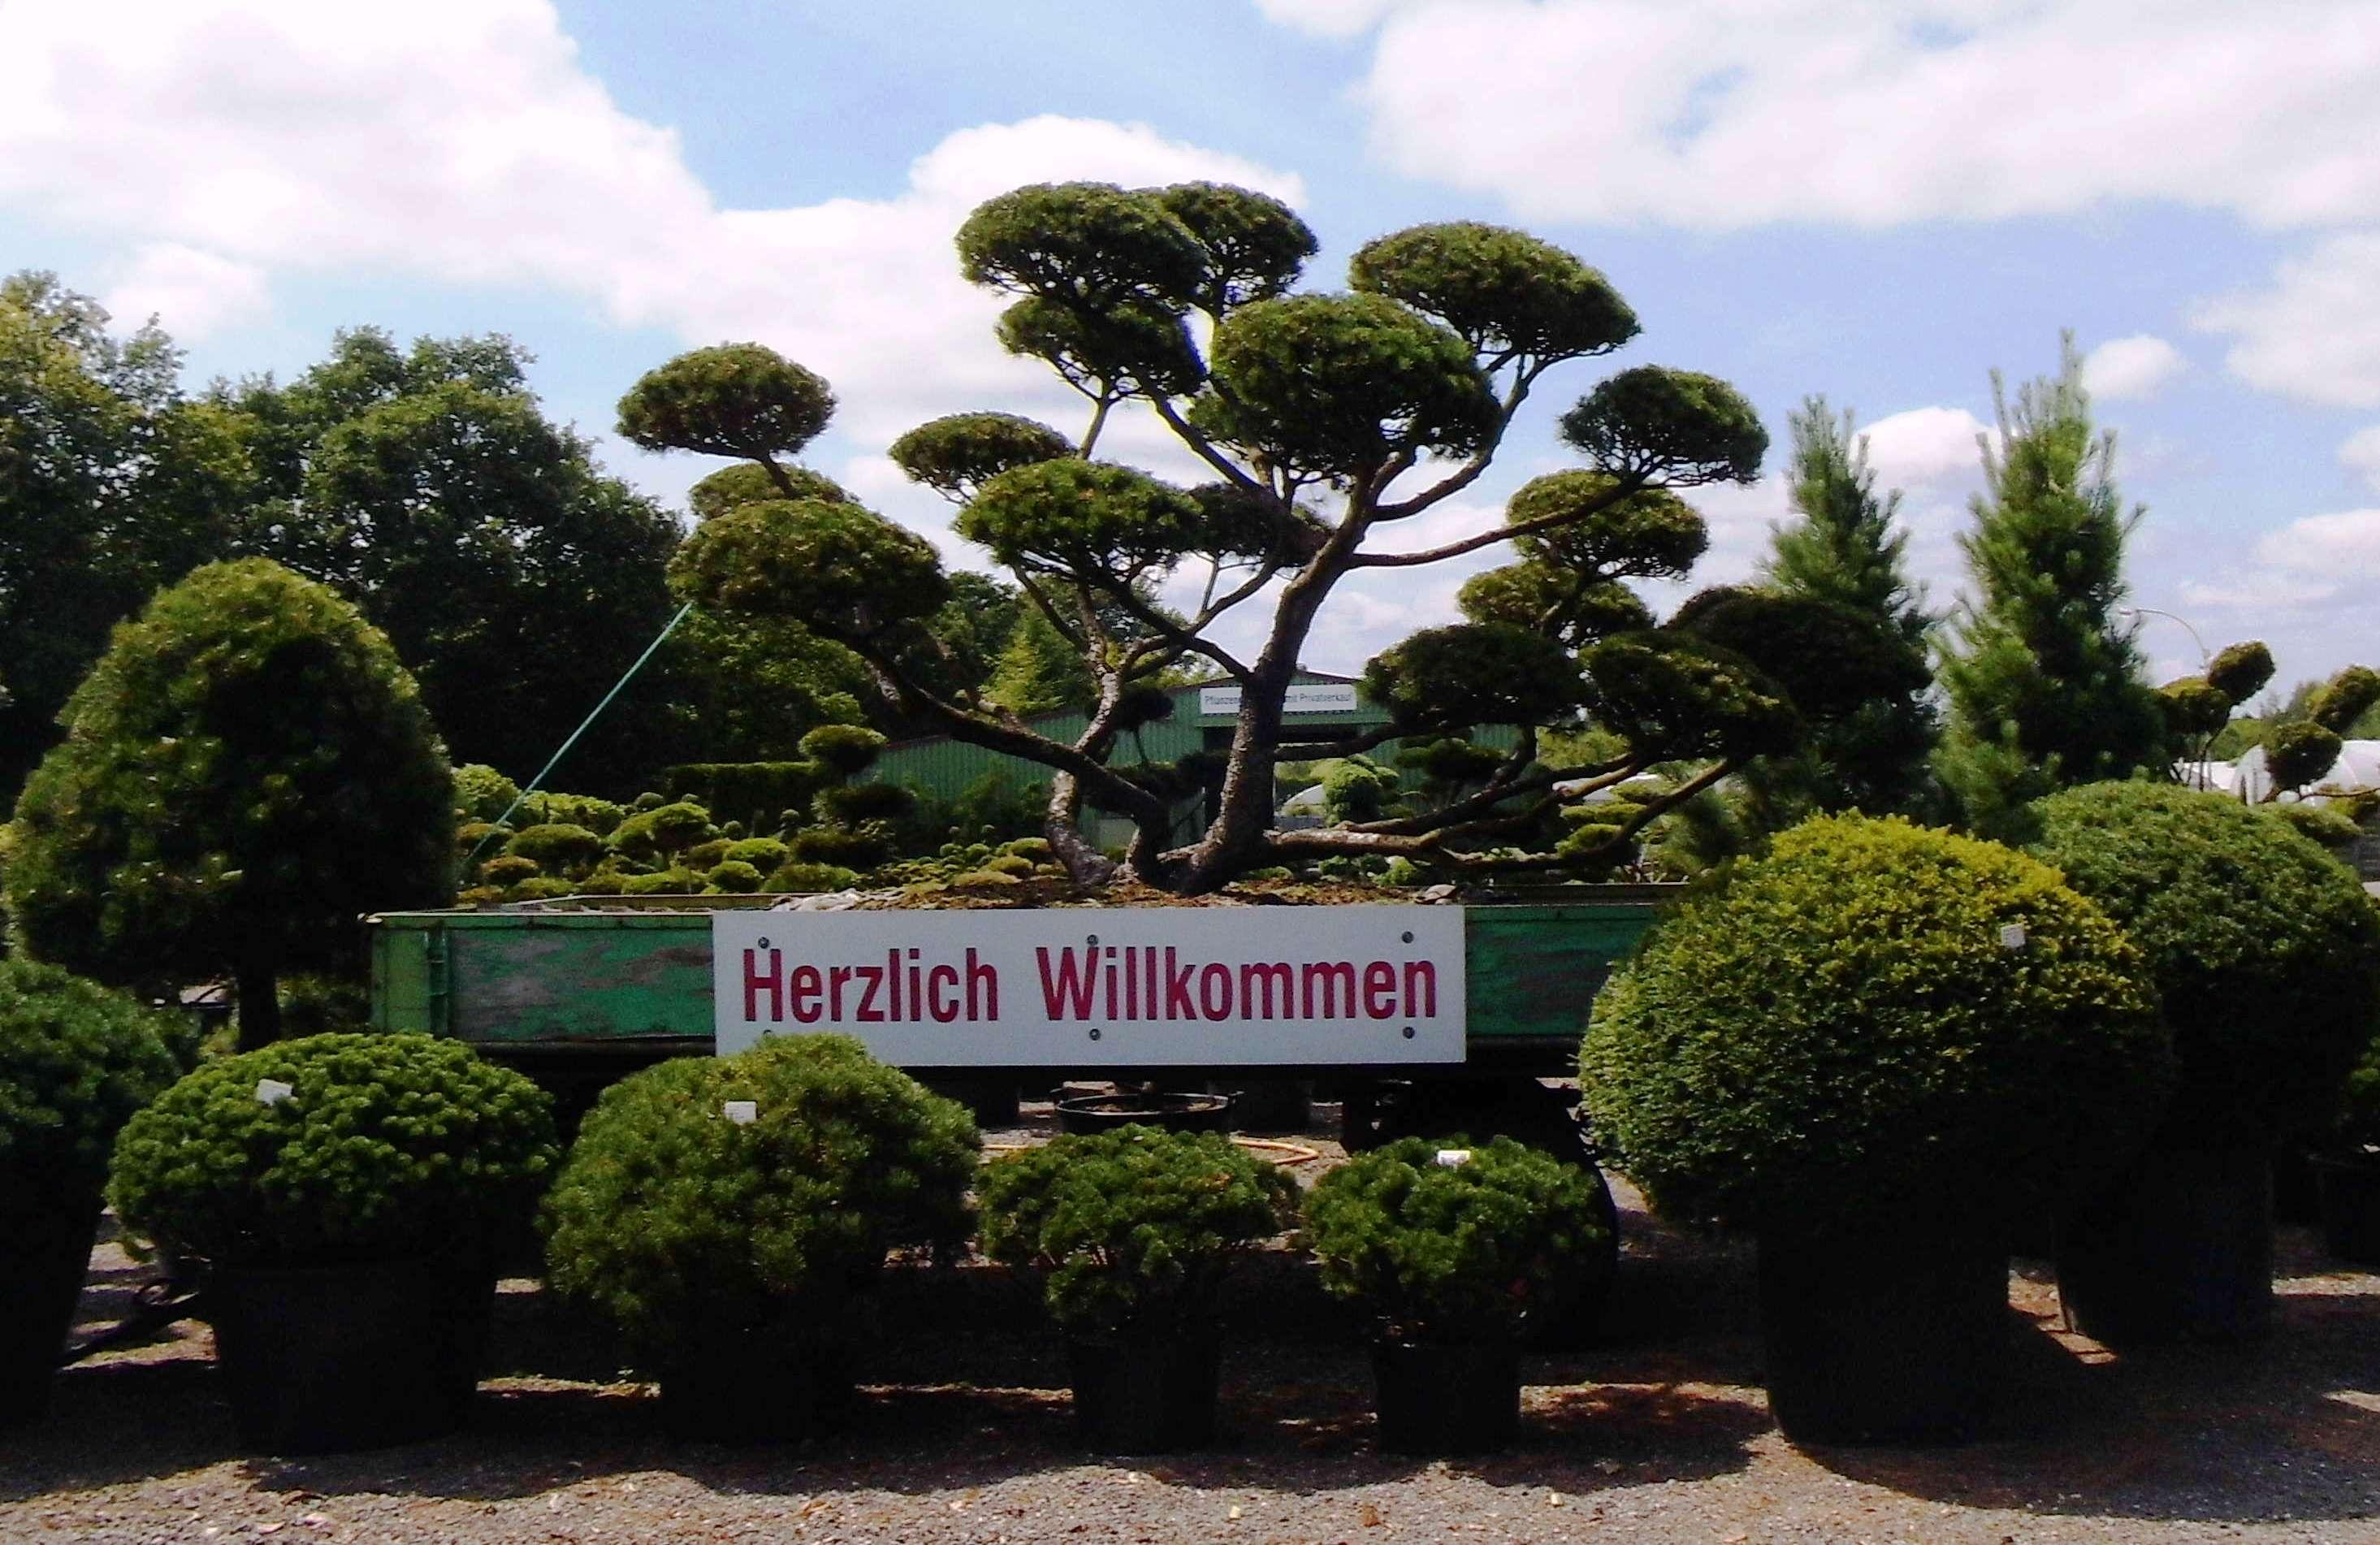 Kiefern Bonsai und Solitäre (Pinus)